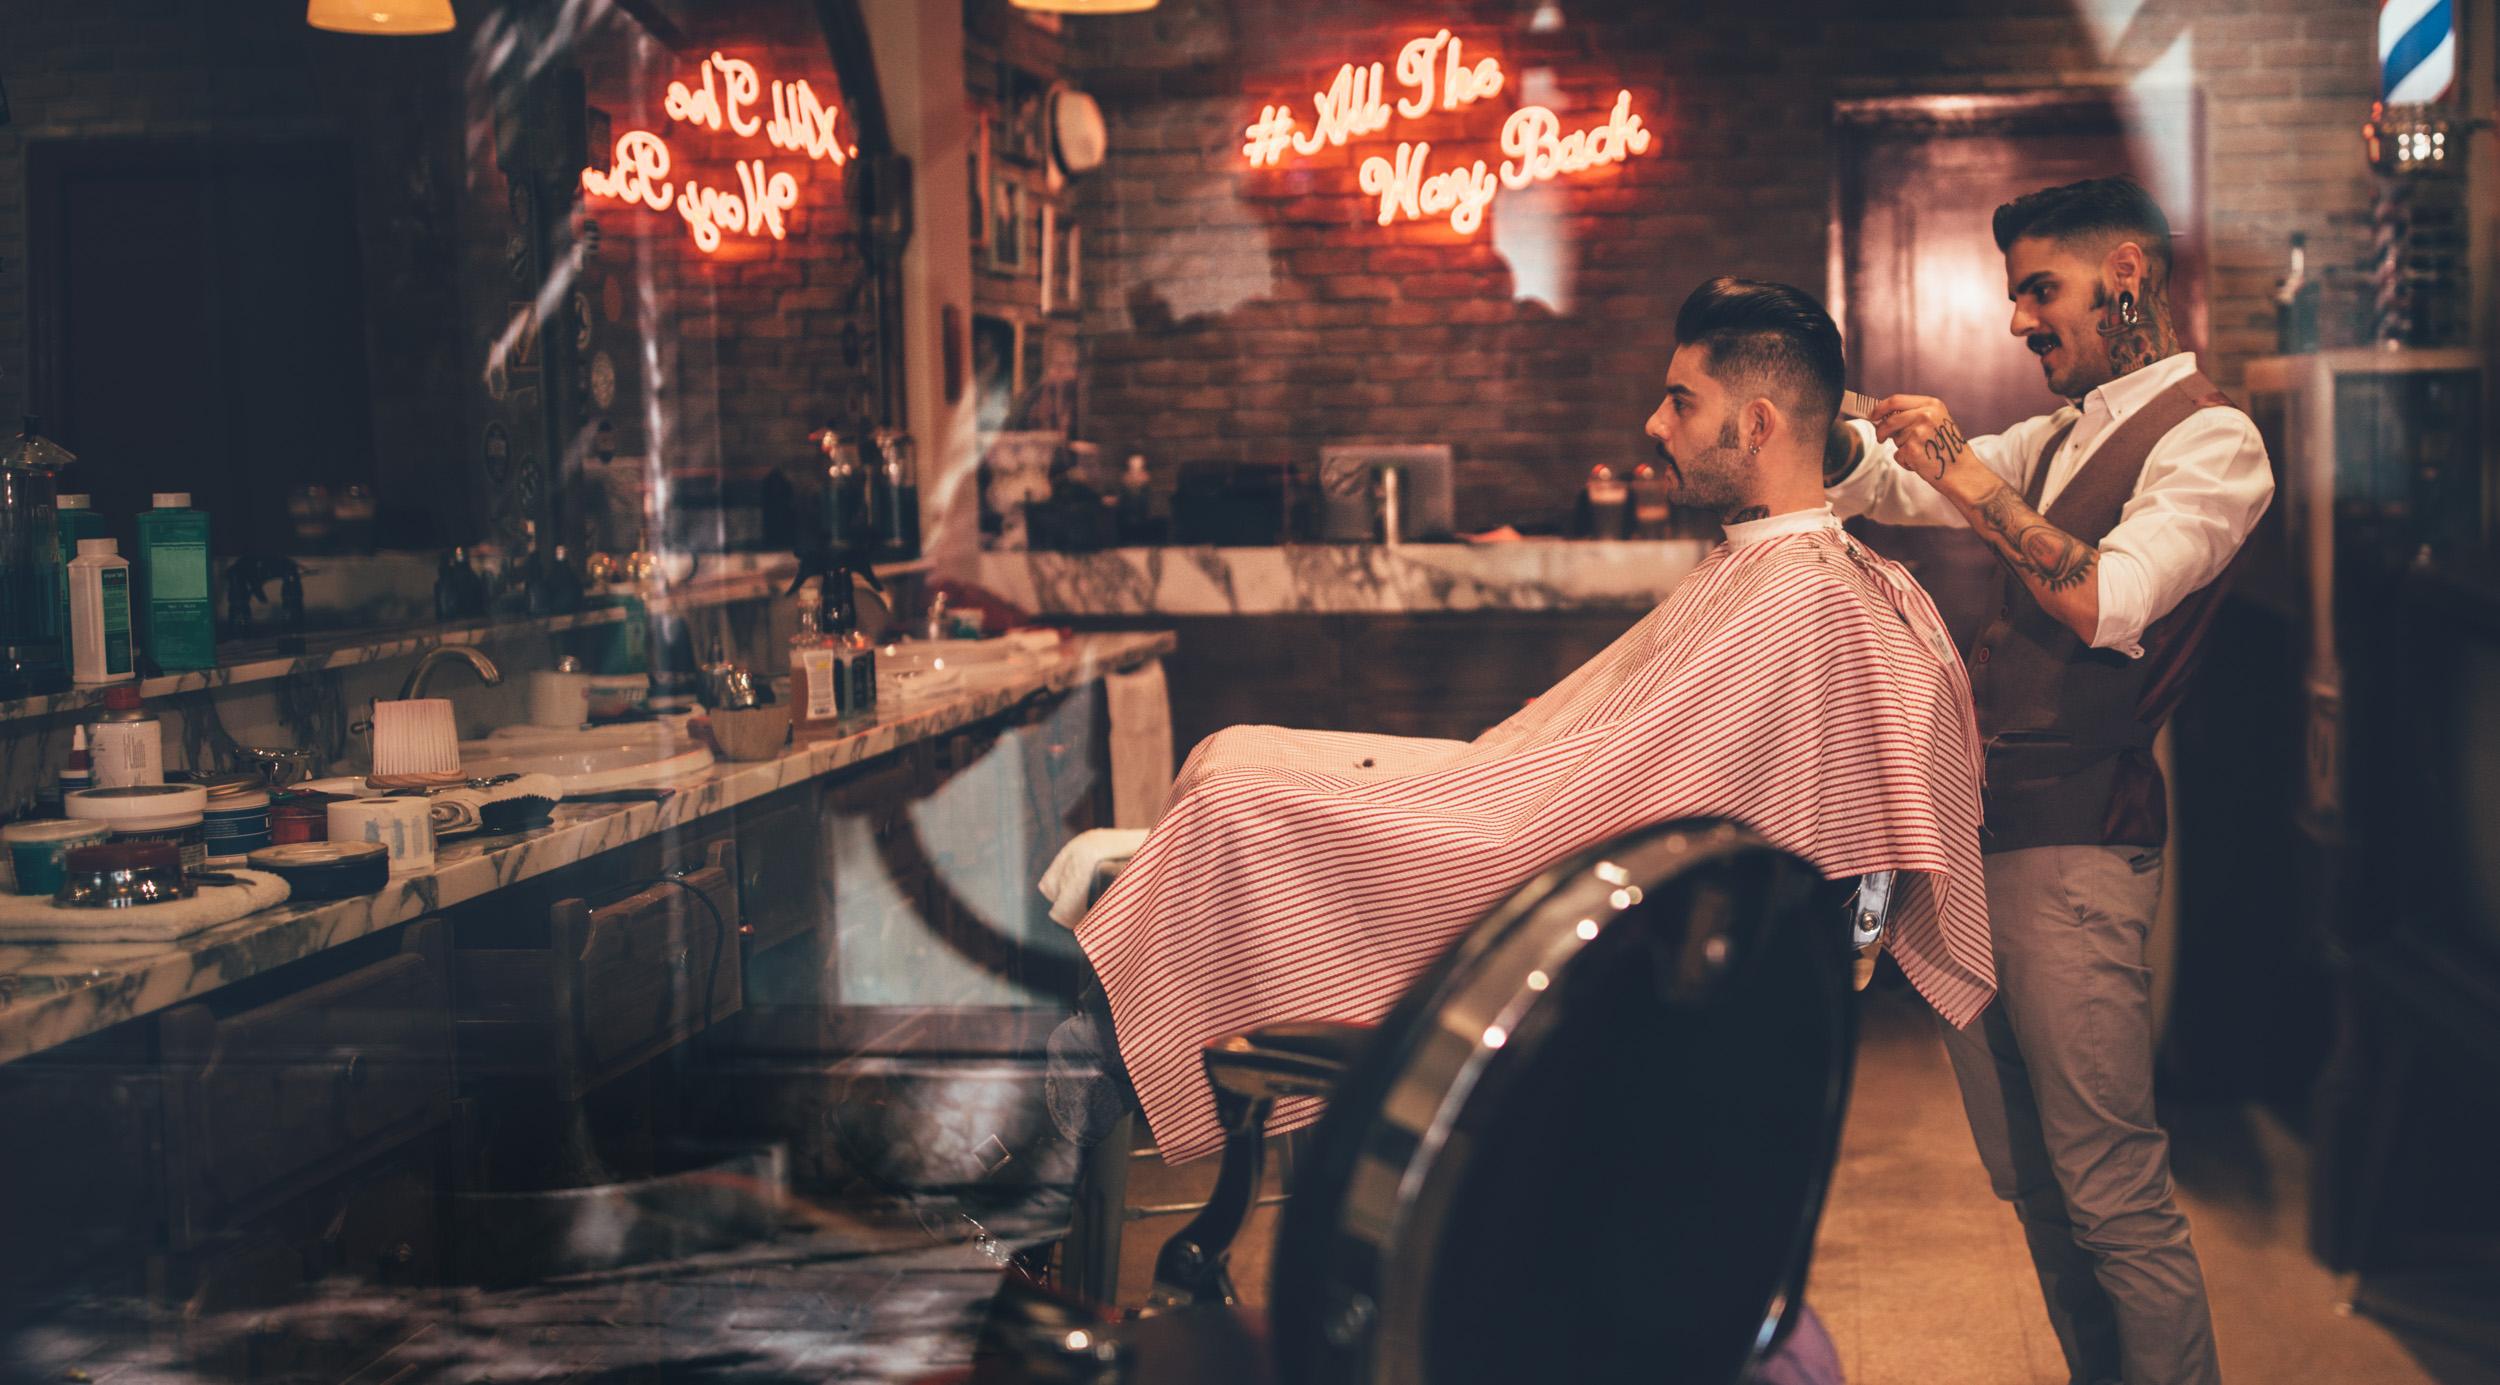 The Dalton Brothers Barber Shop